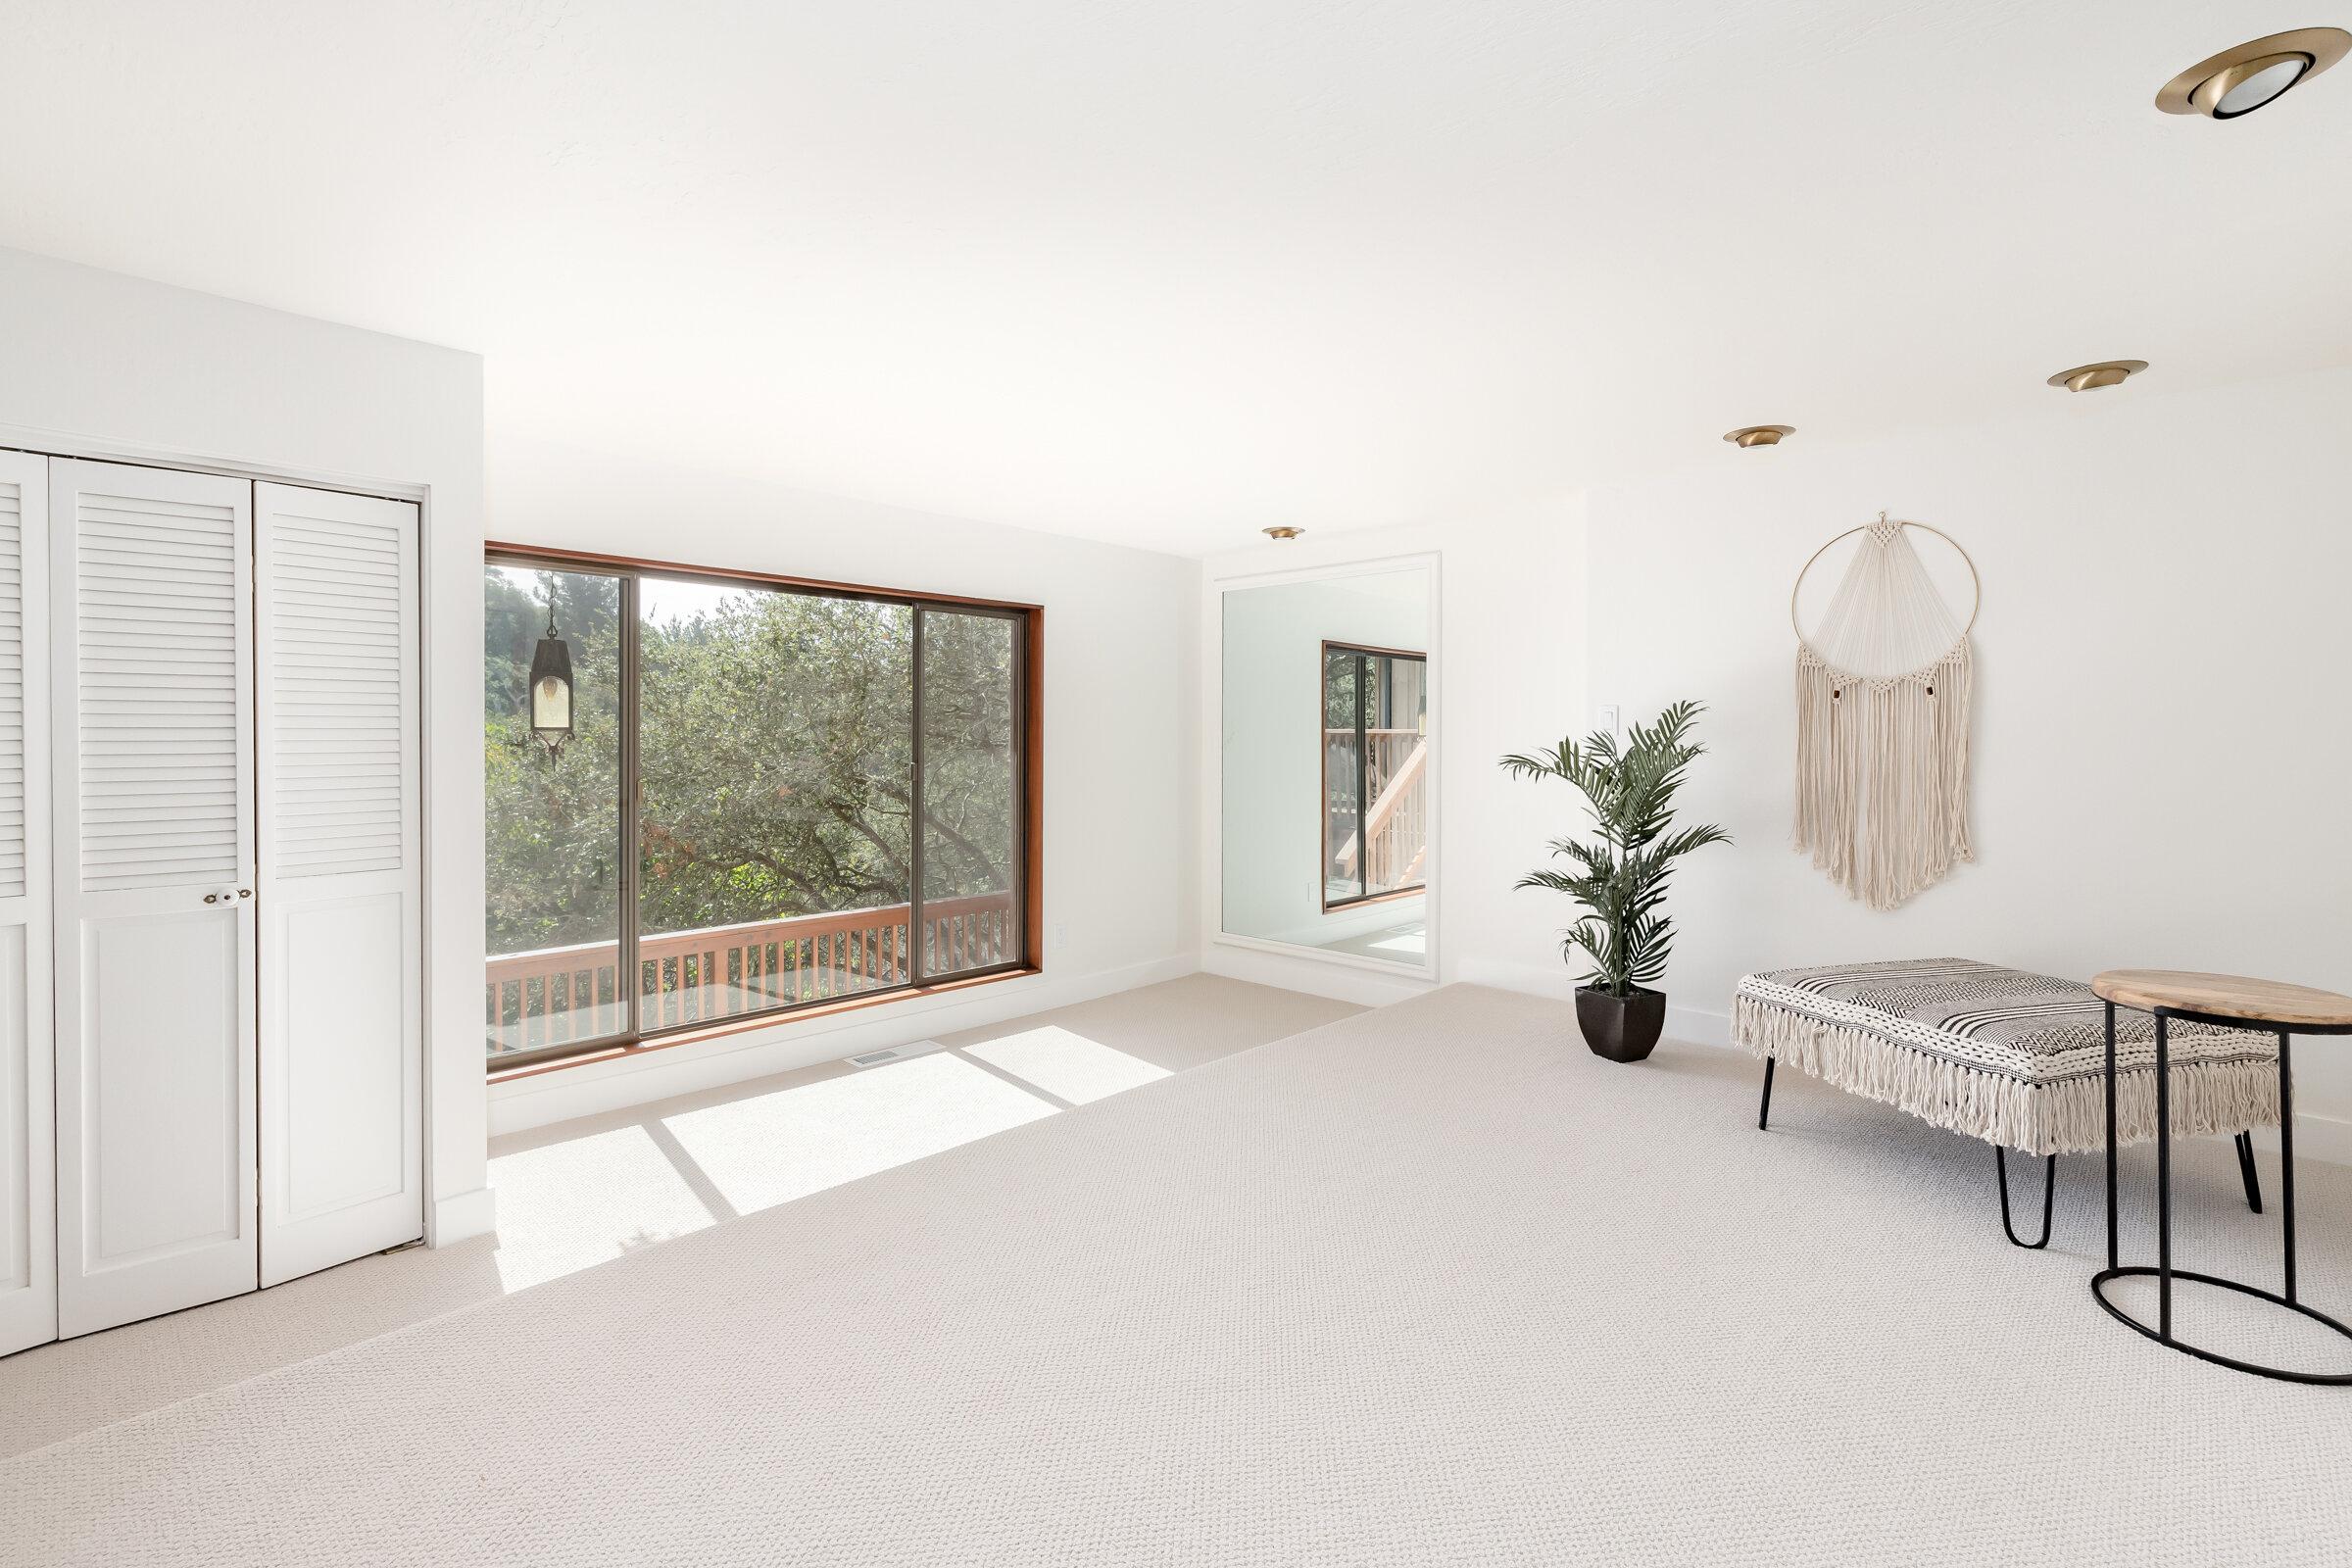 Treetop Oasis Interior 4